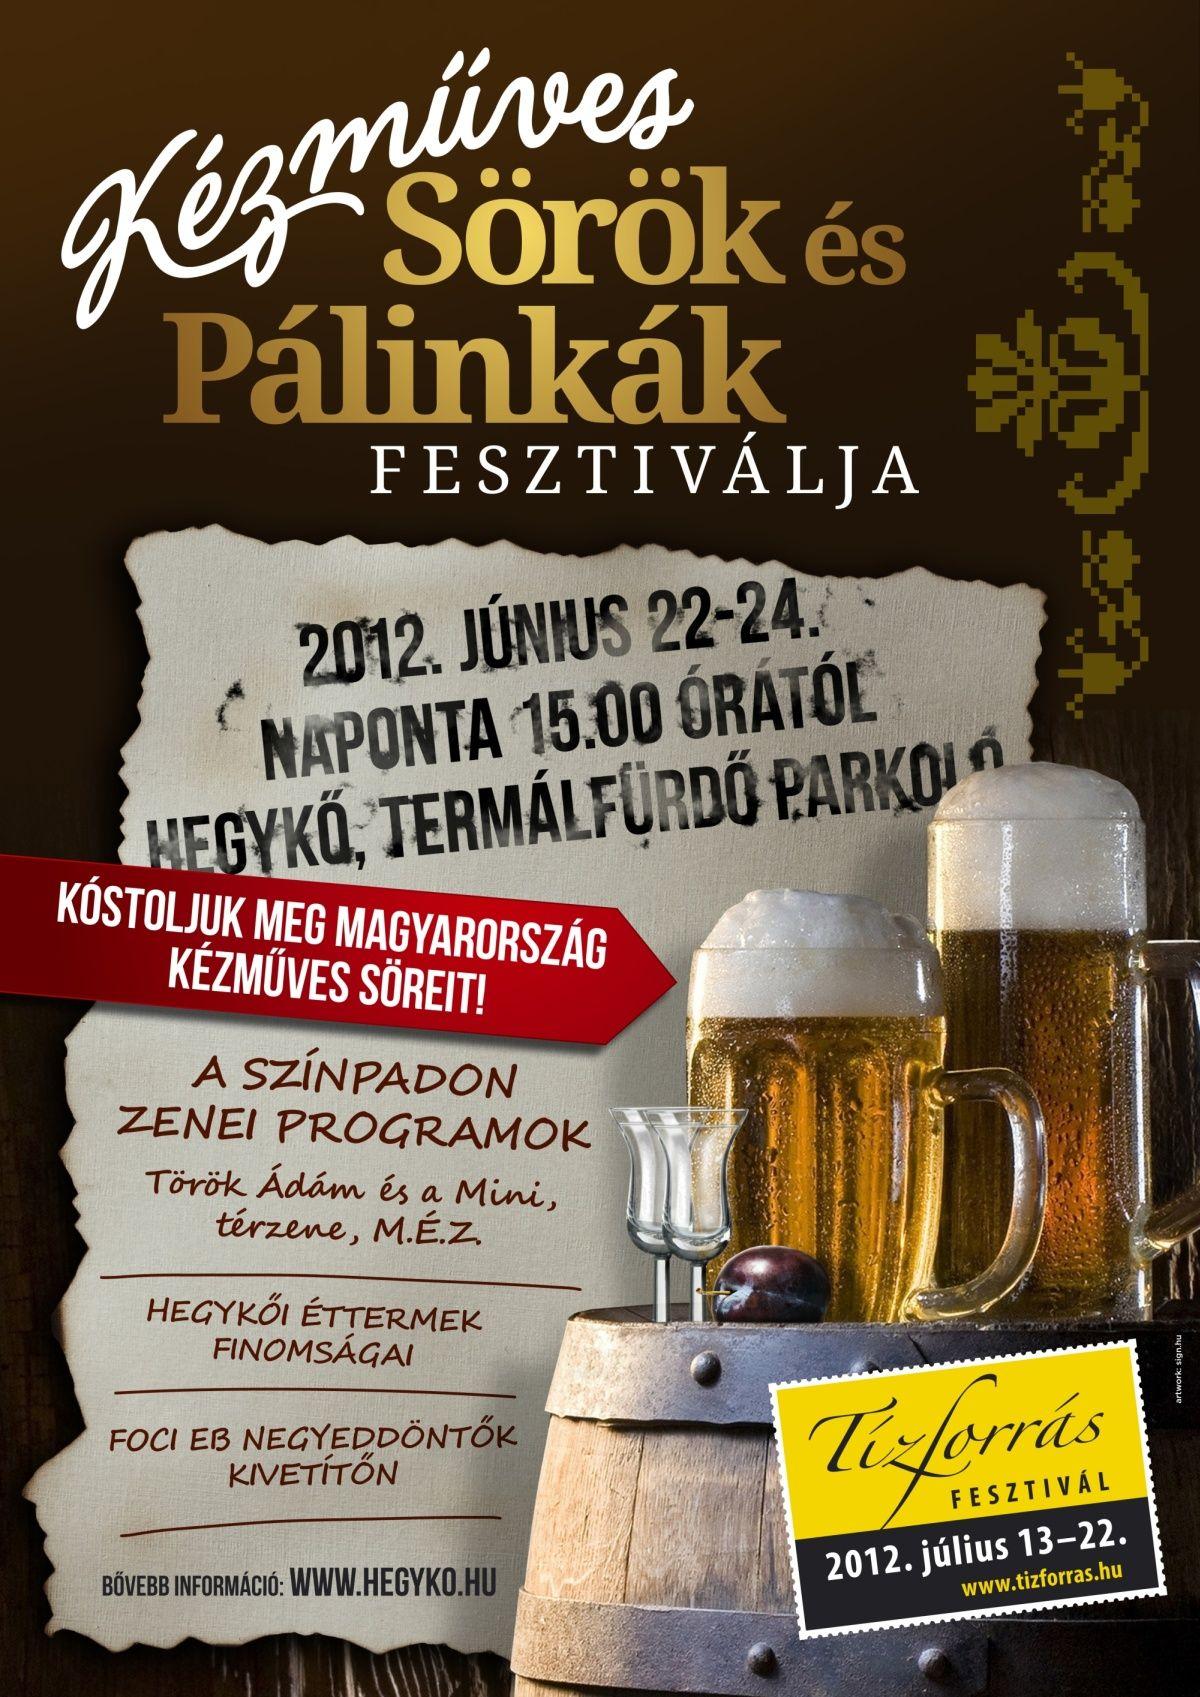 sor_palinka_fesztival_20120611.jpg